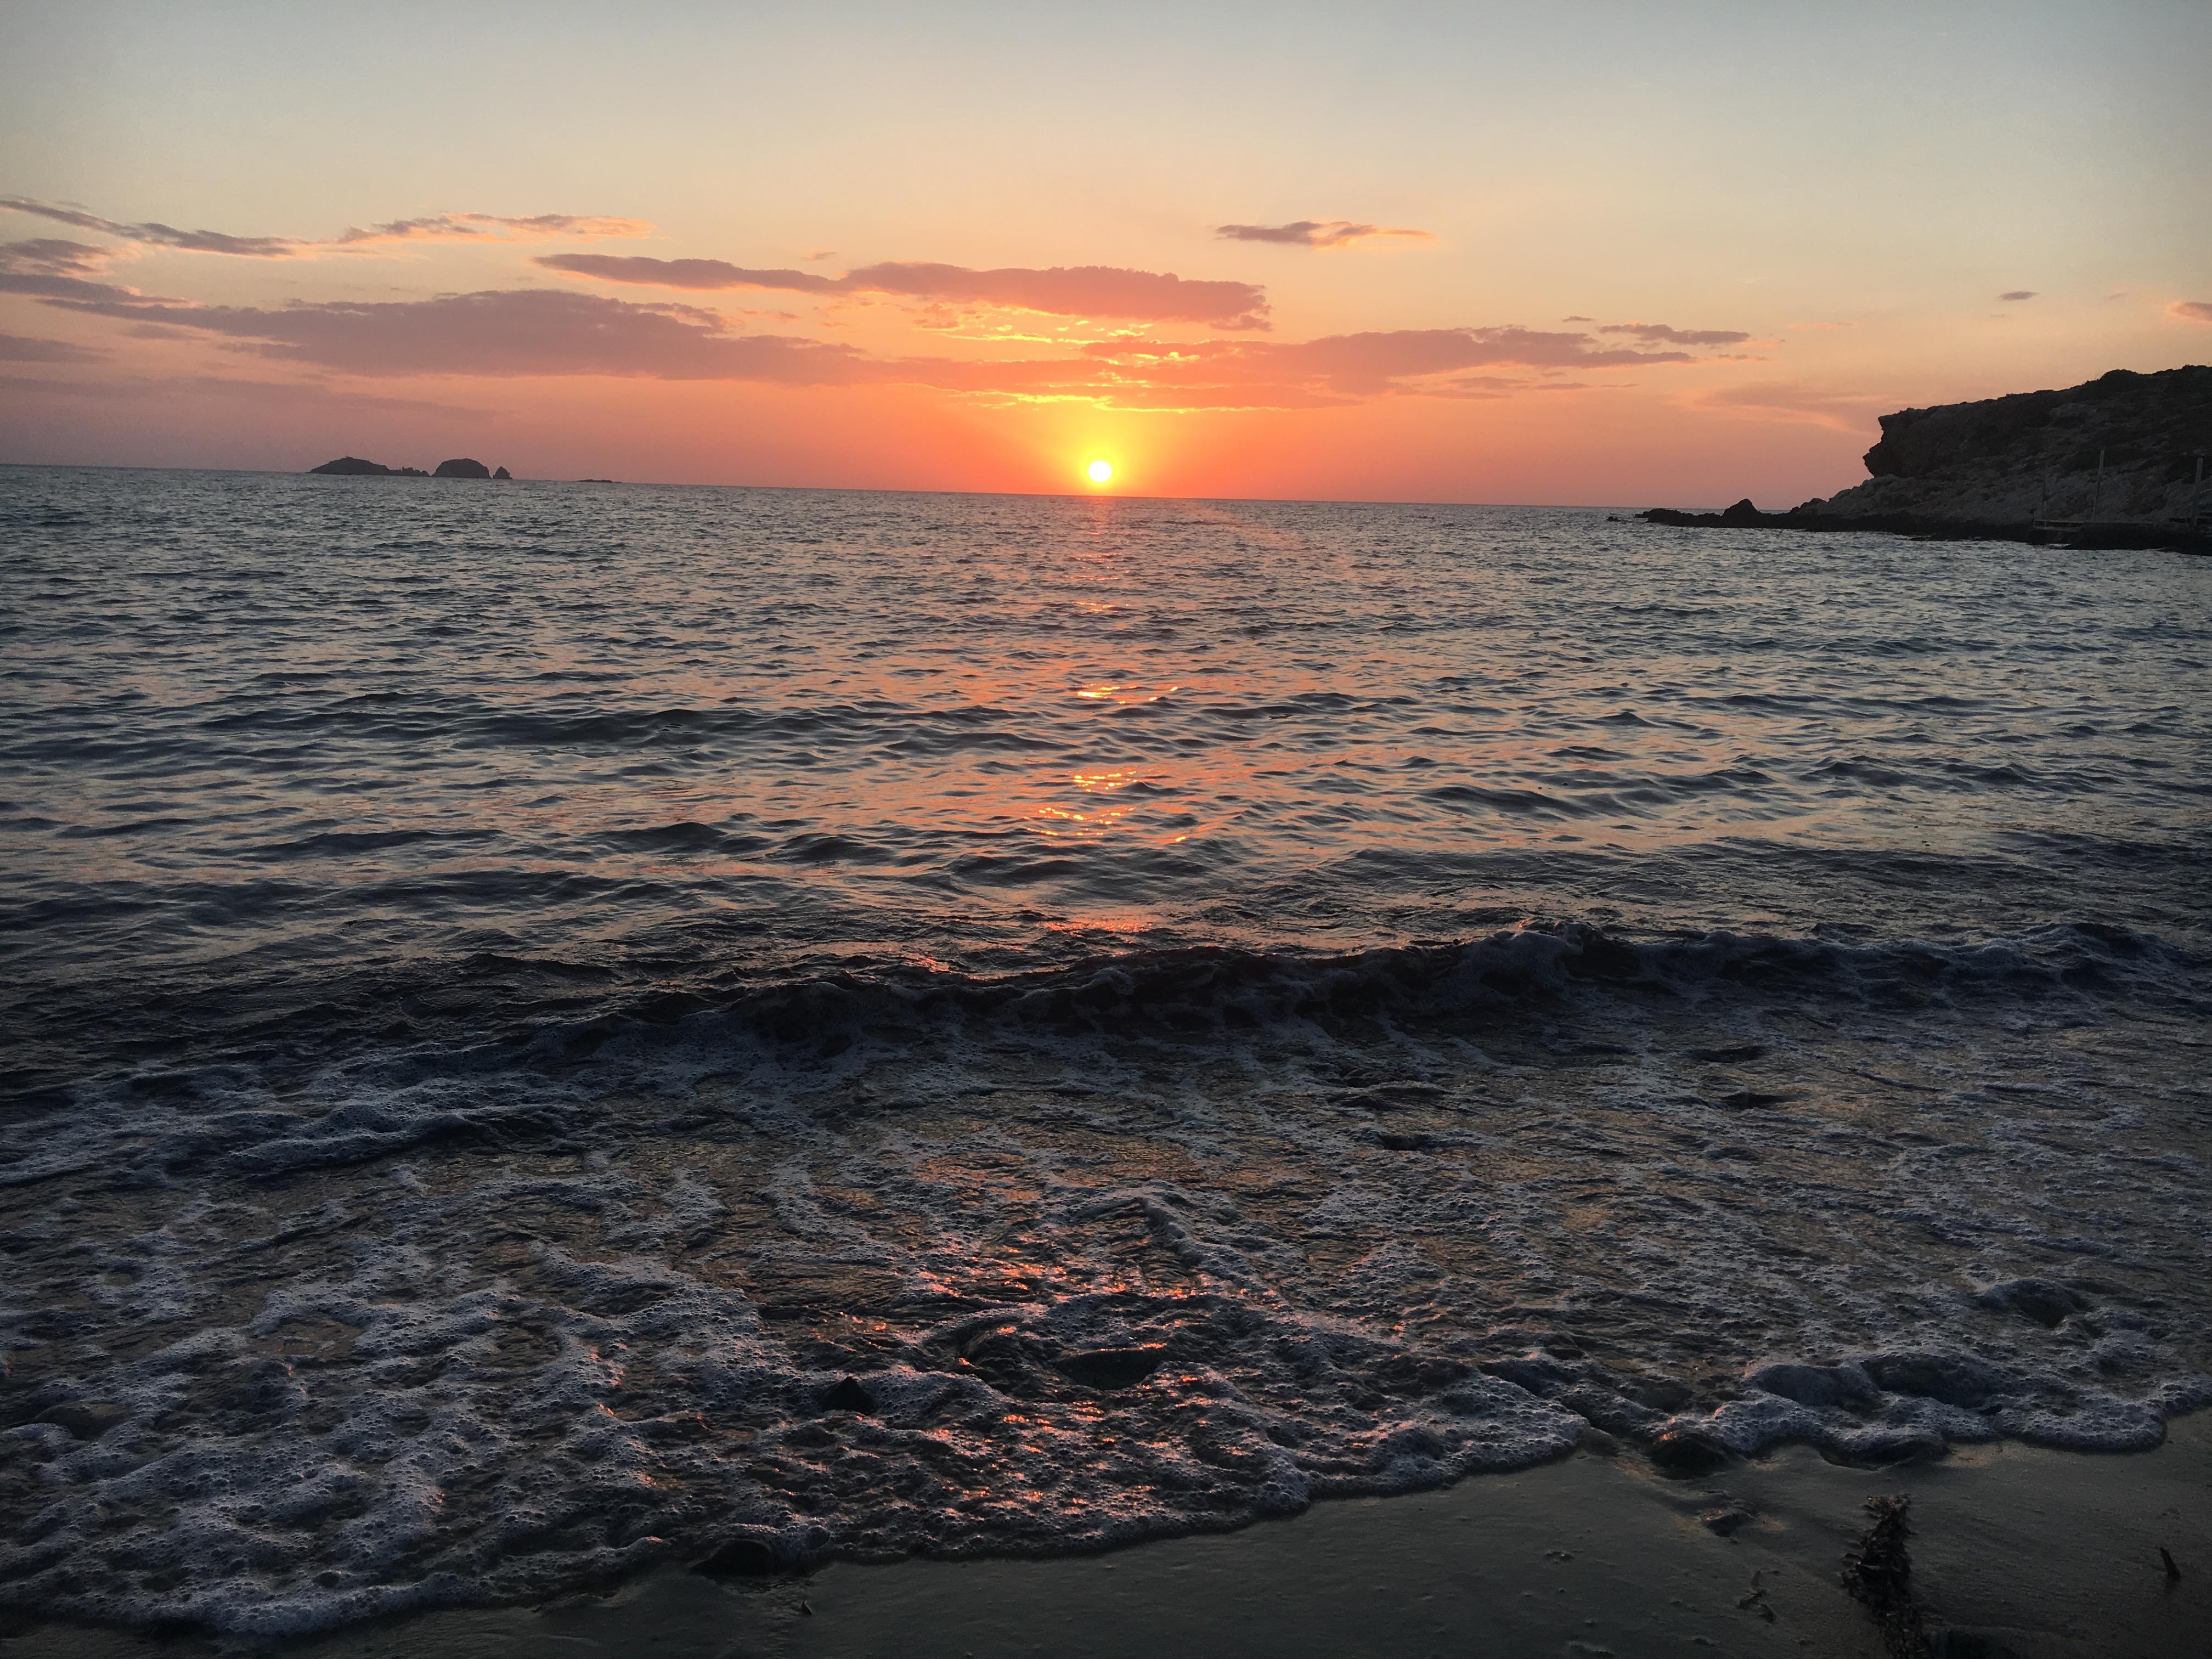 Plage Paros, Îles Cyclades, Grèce